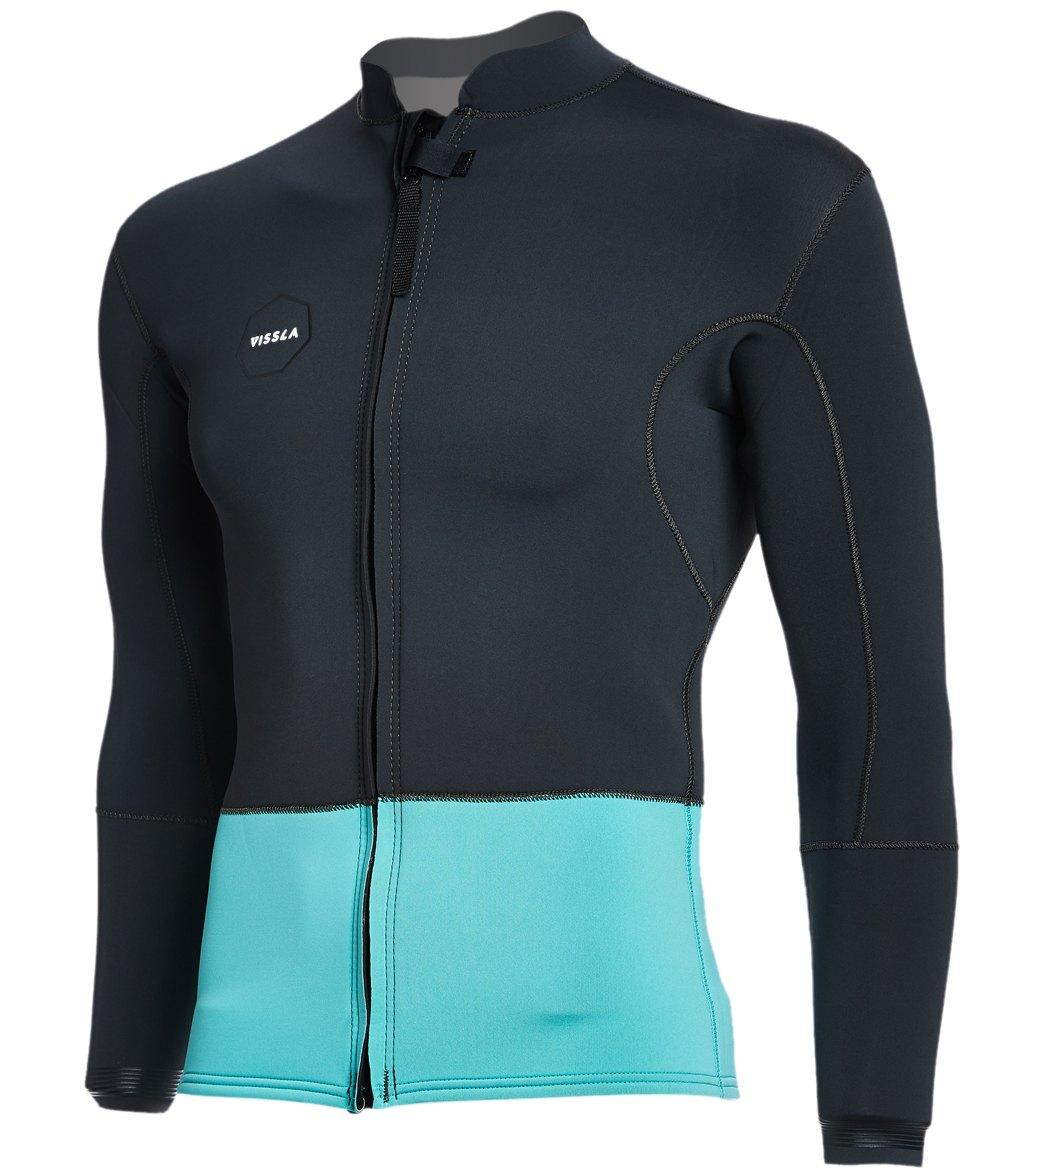 Vissla Men's 2MM Front Zip Wetsuit Jacket at SwimOutlet.com - Free Shipping